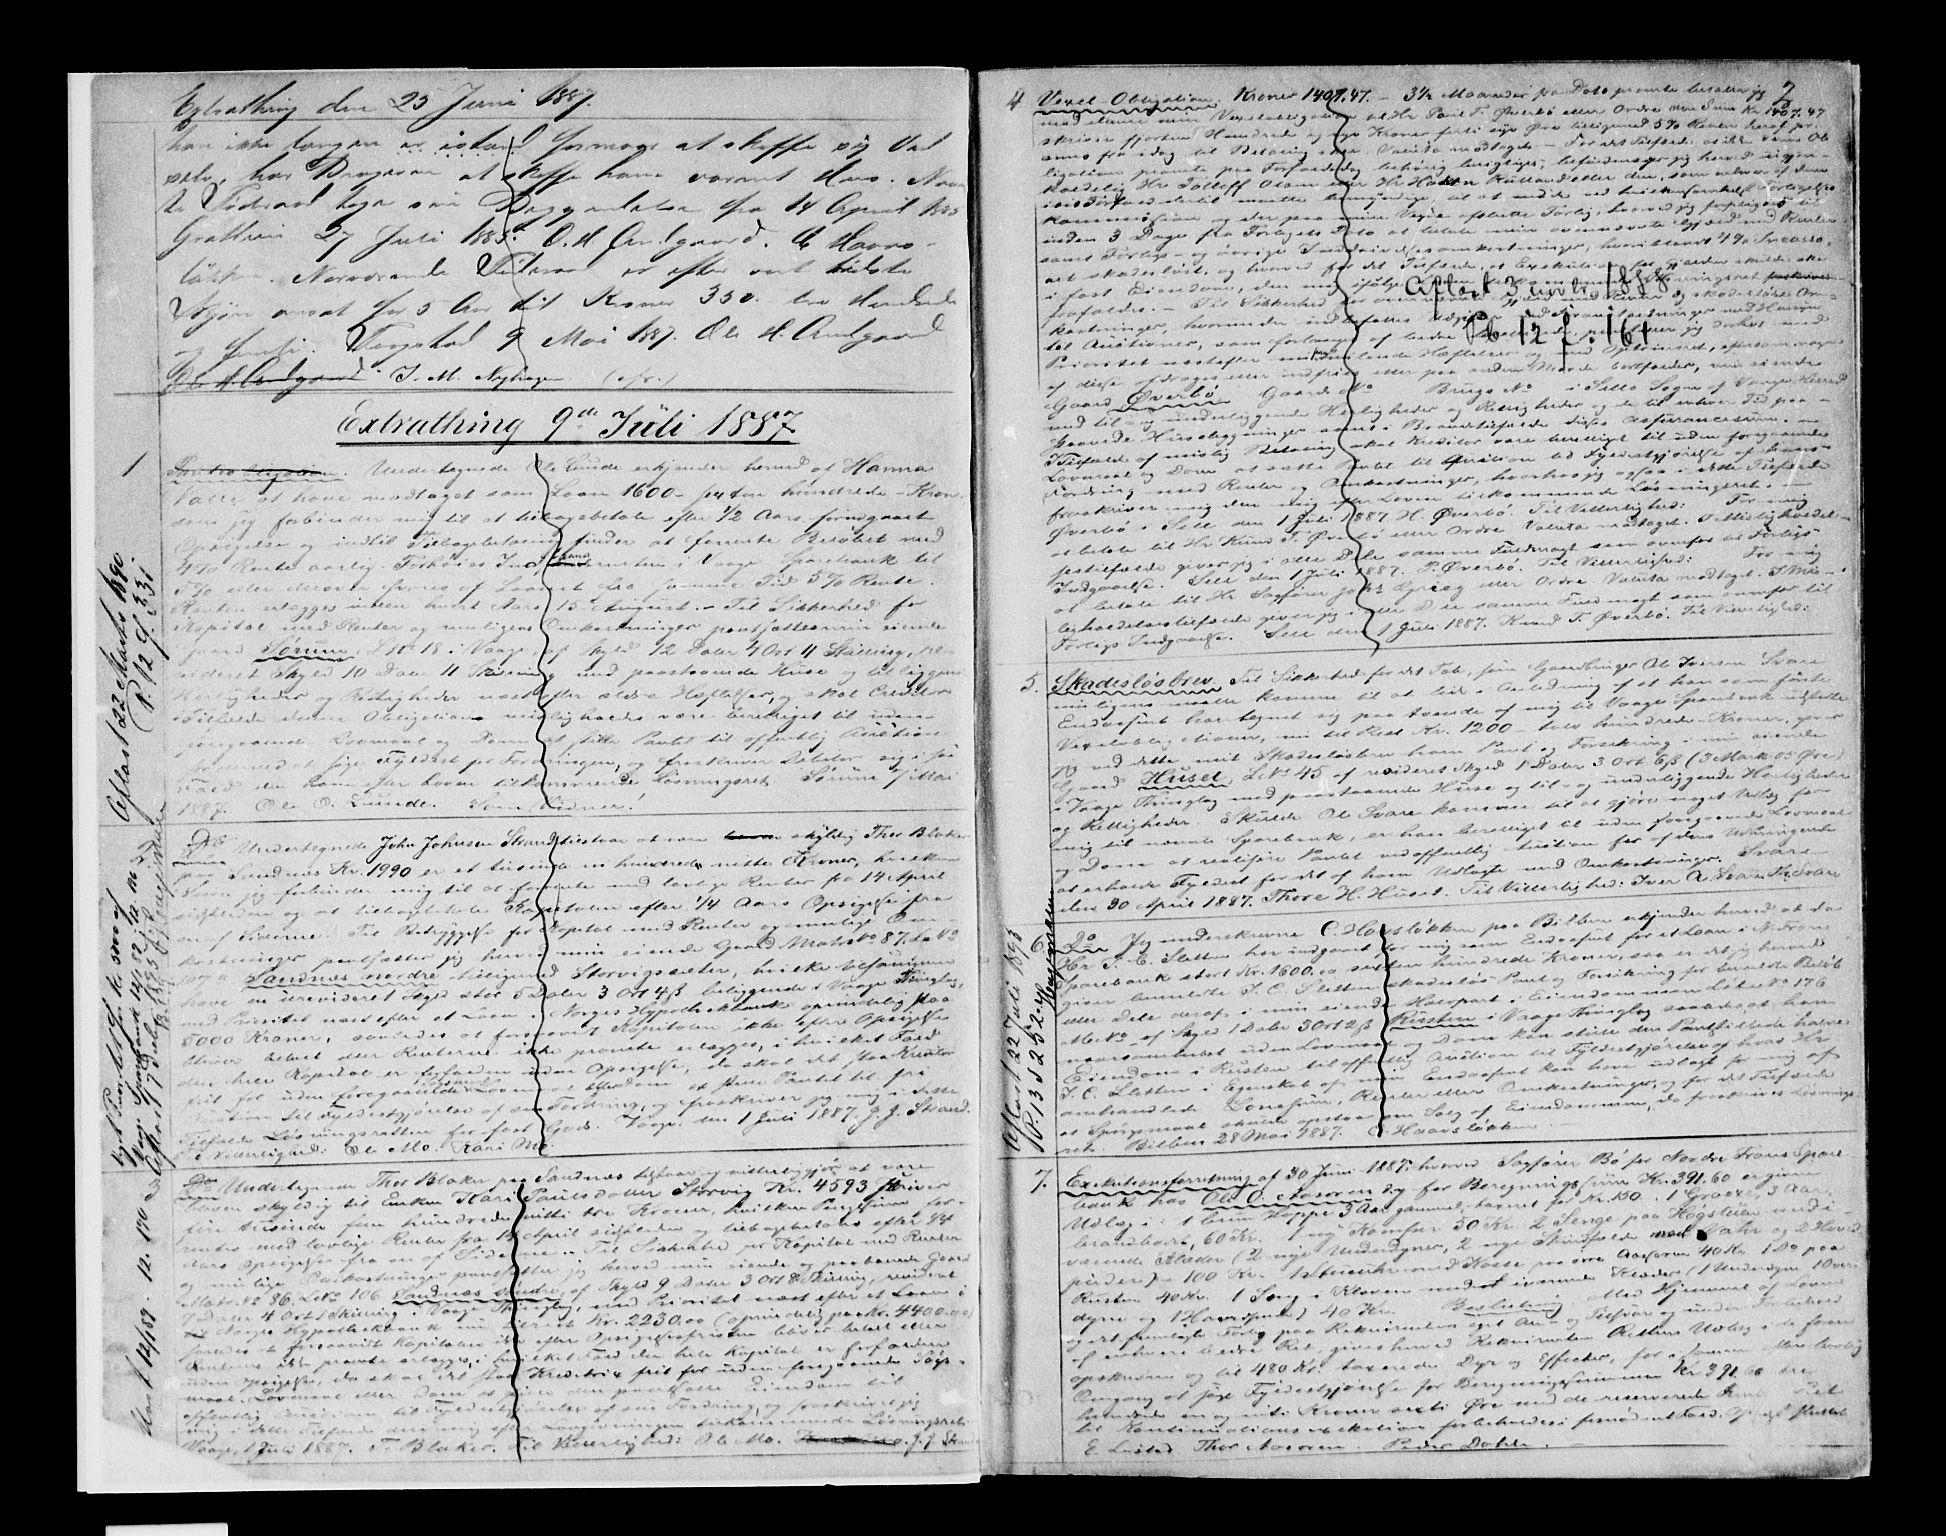 SAH, Nord-Gudbrandsdal tingrett, H/Hb/Hba/L0012: Pantebok nr. 12, 1887-1892, s. 2